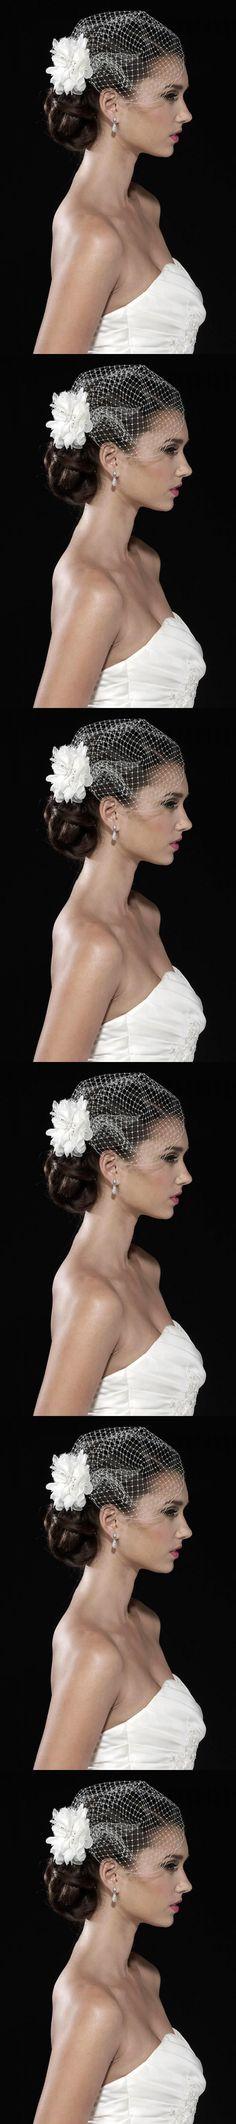 White Tulle juliet cap Bird Cage Wedding Accesories Veil Bridal Birdcage Wedding Veils Short Bridal velos de novia $13.98